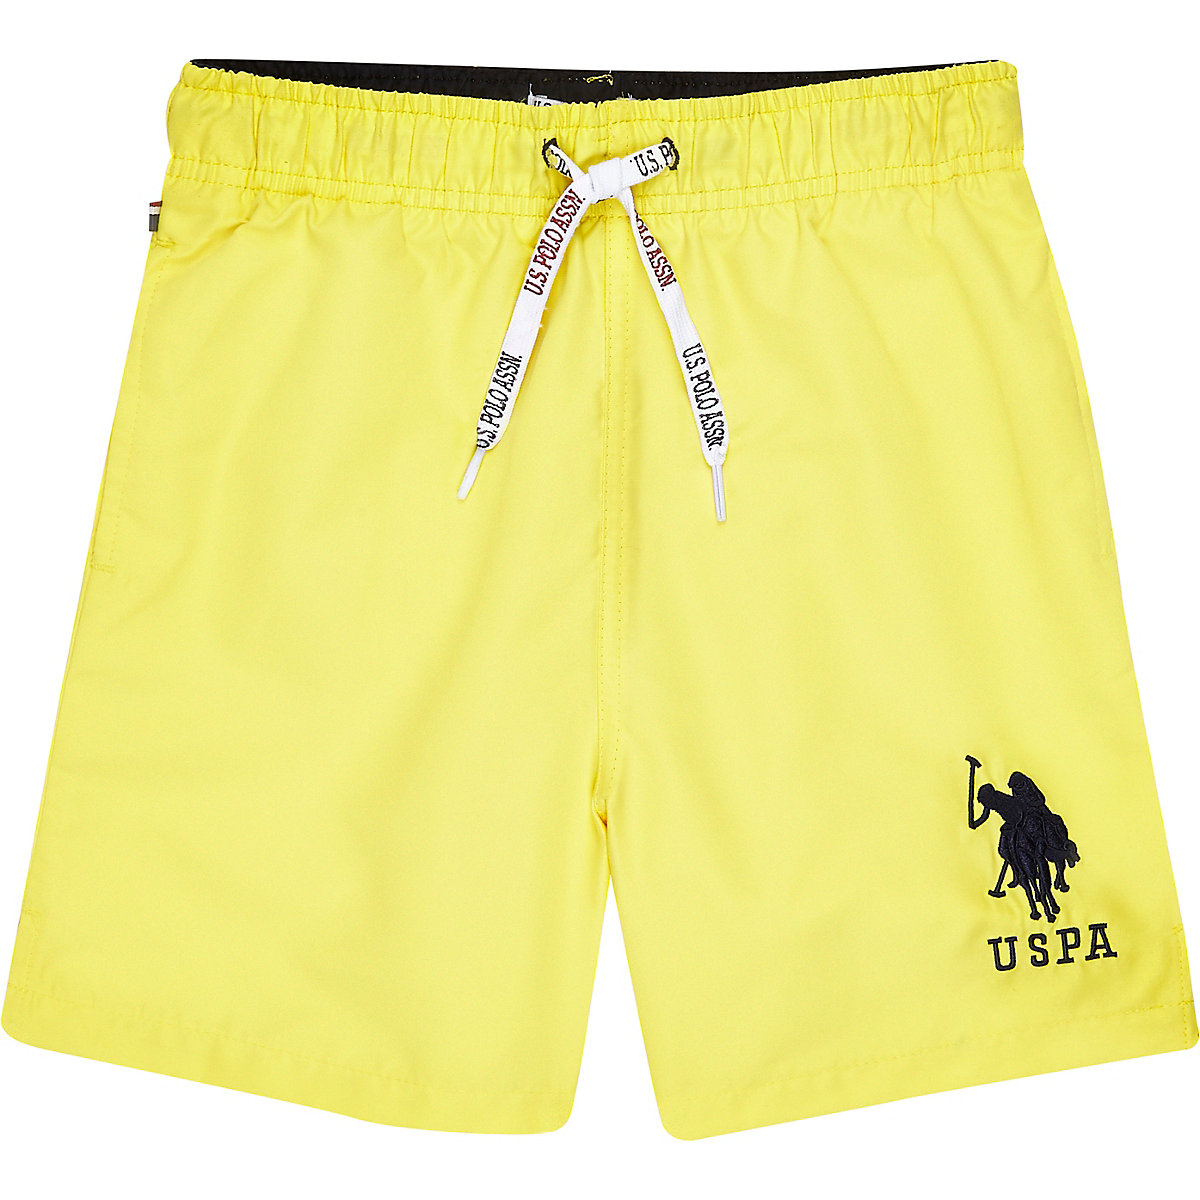 Boys yellow U.S. Polo Assn. swim trunks